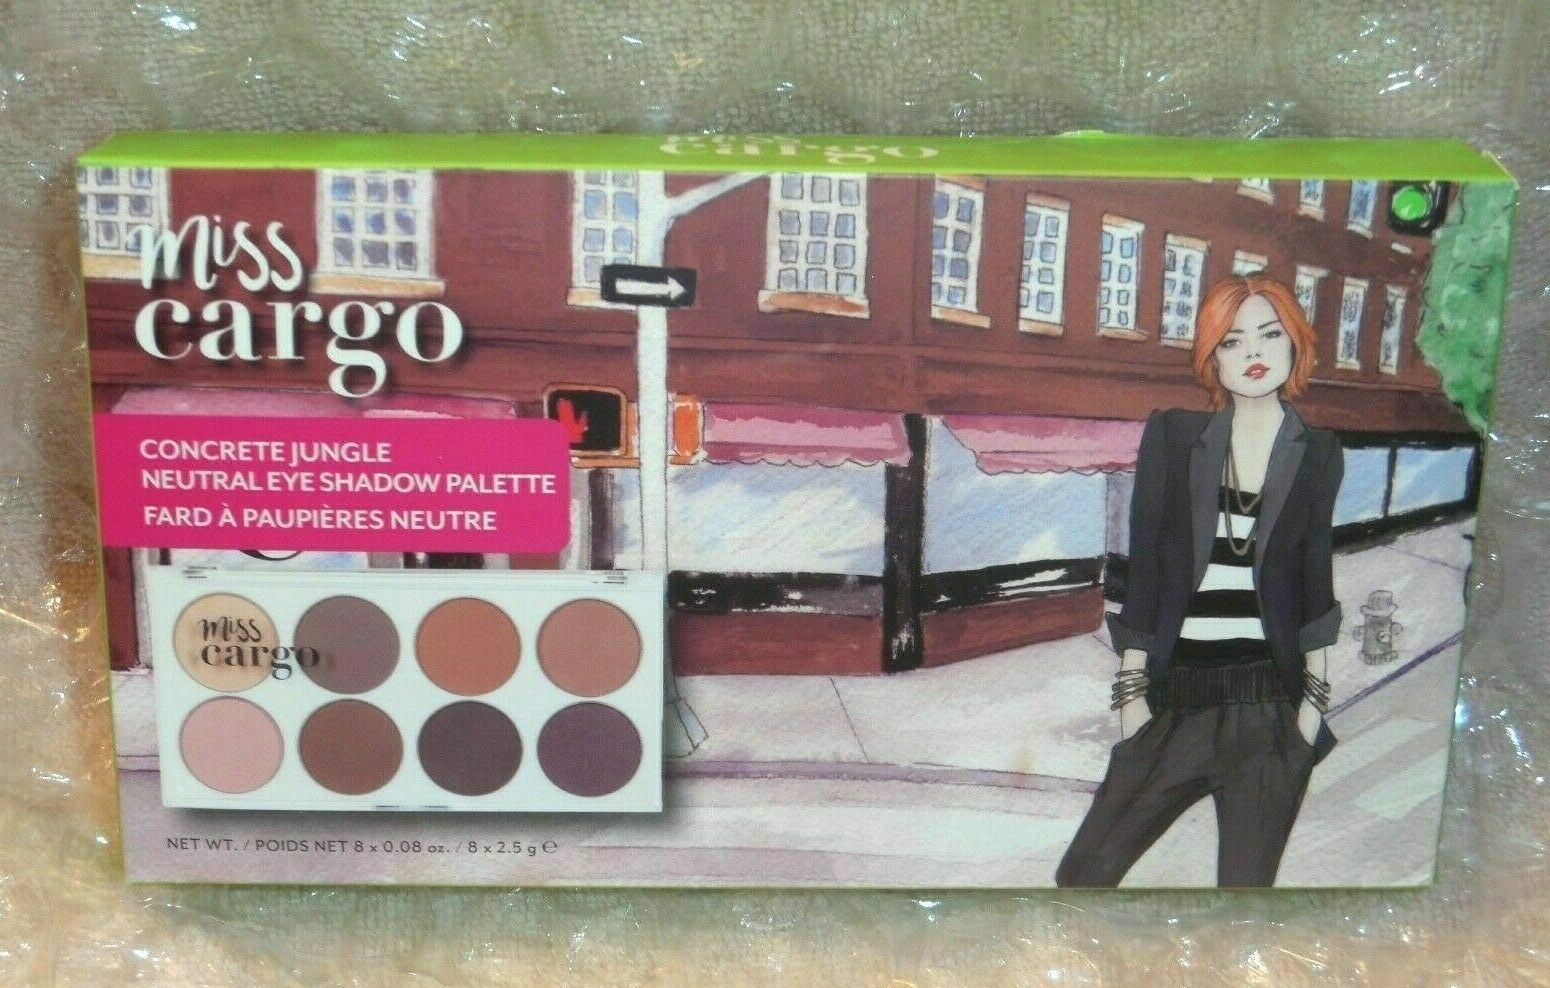 Cargo Cosmetics Miss Cargo Concrete Jungle Neutral Eyeshadow Palette  - $12.38